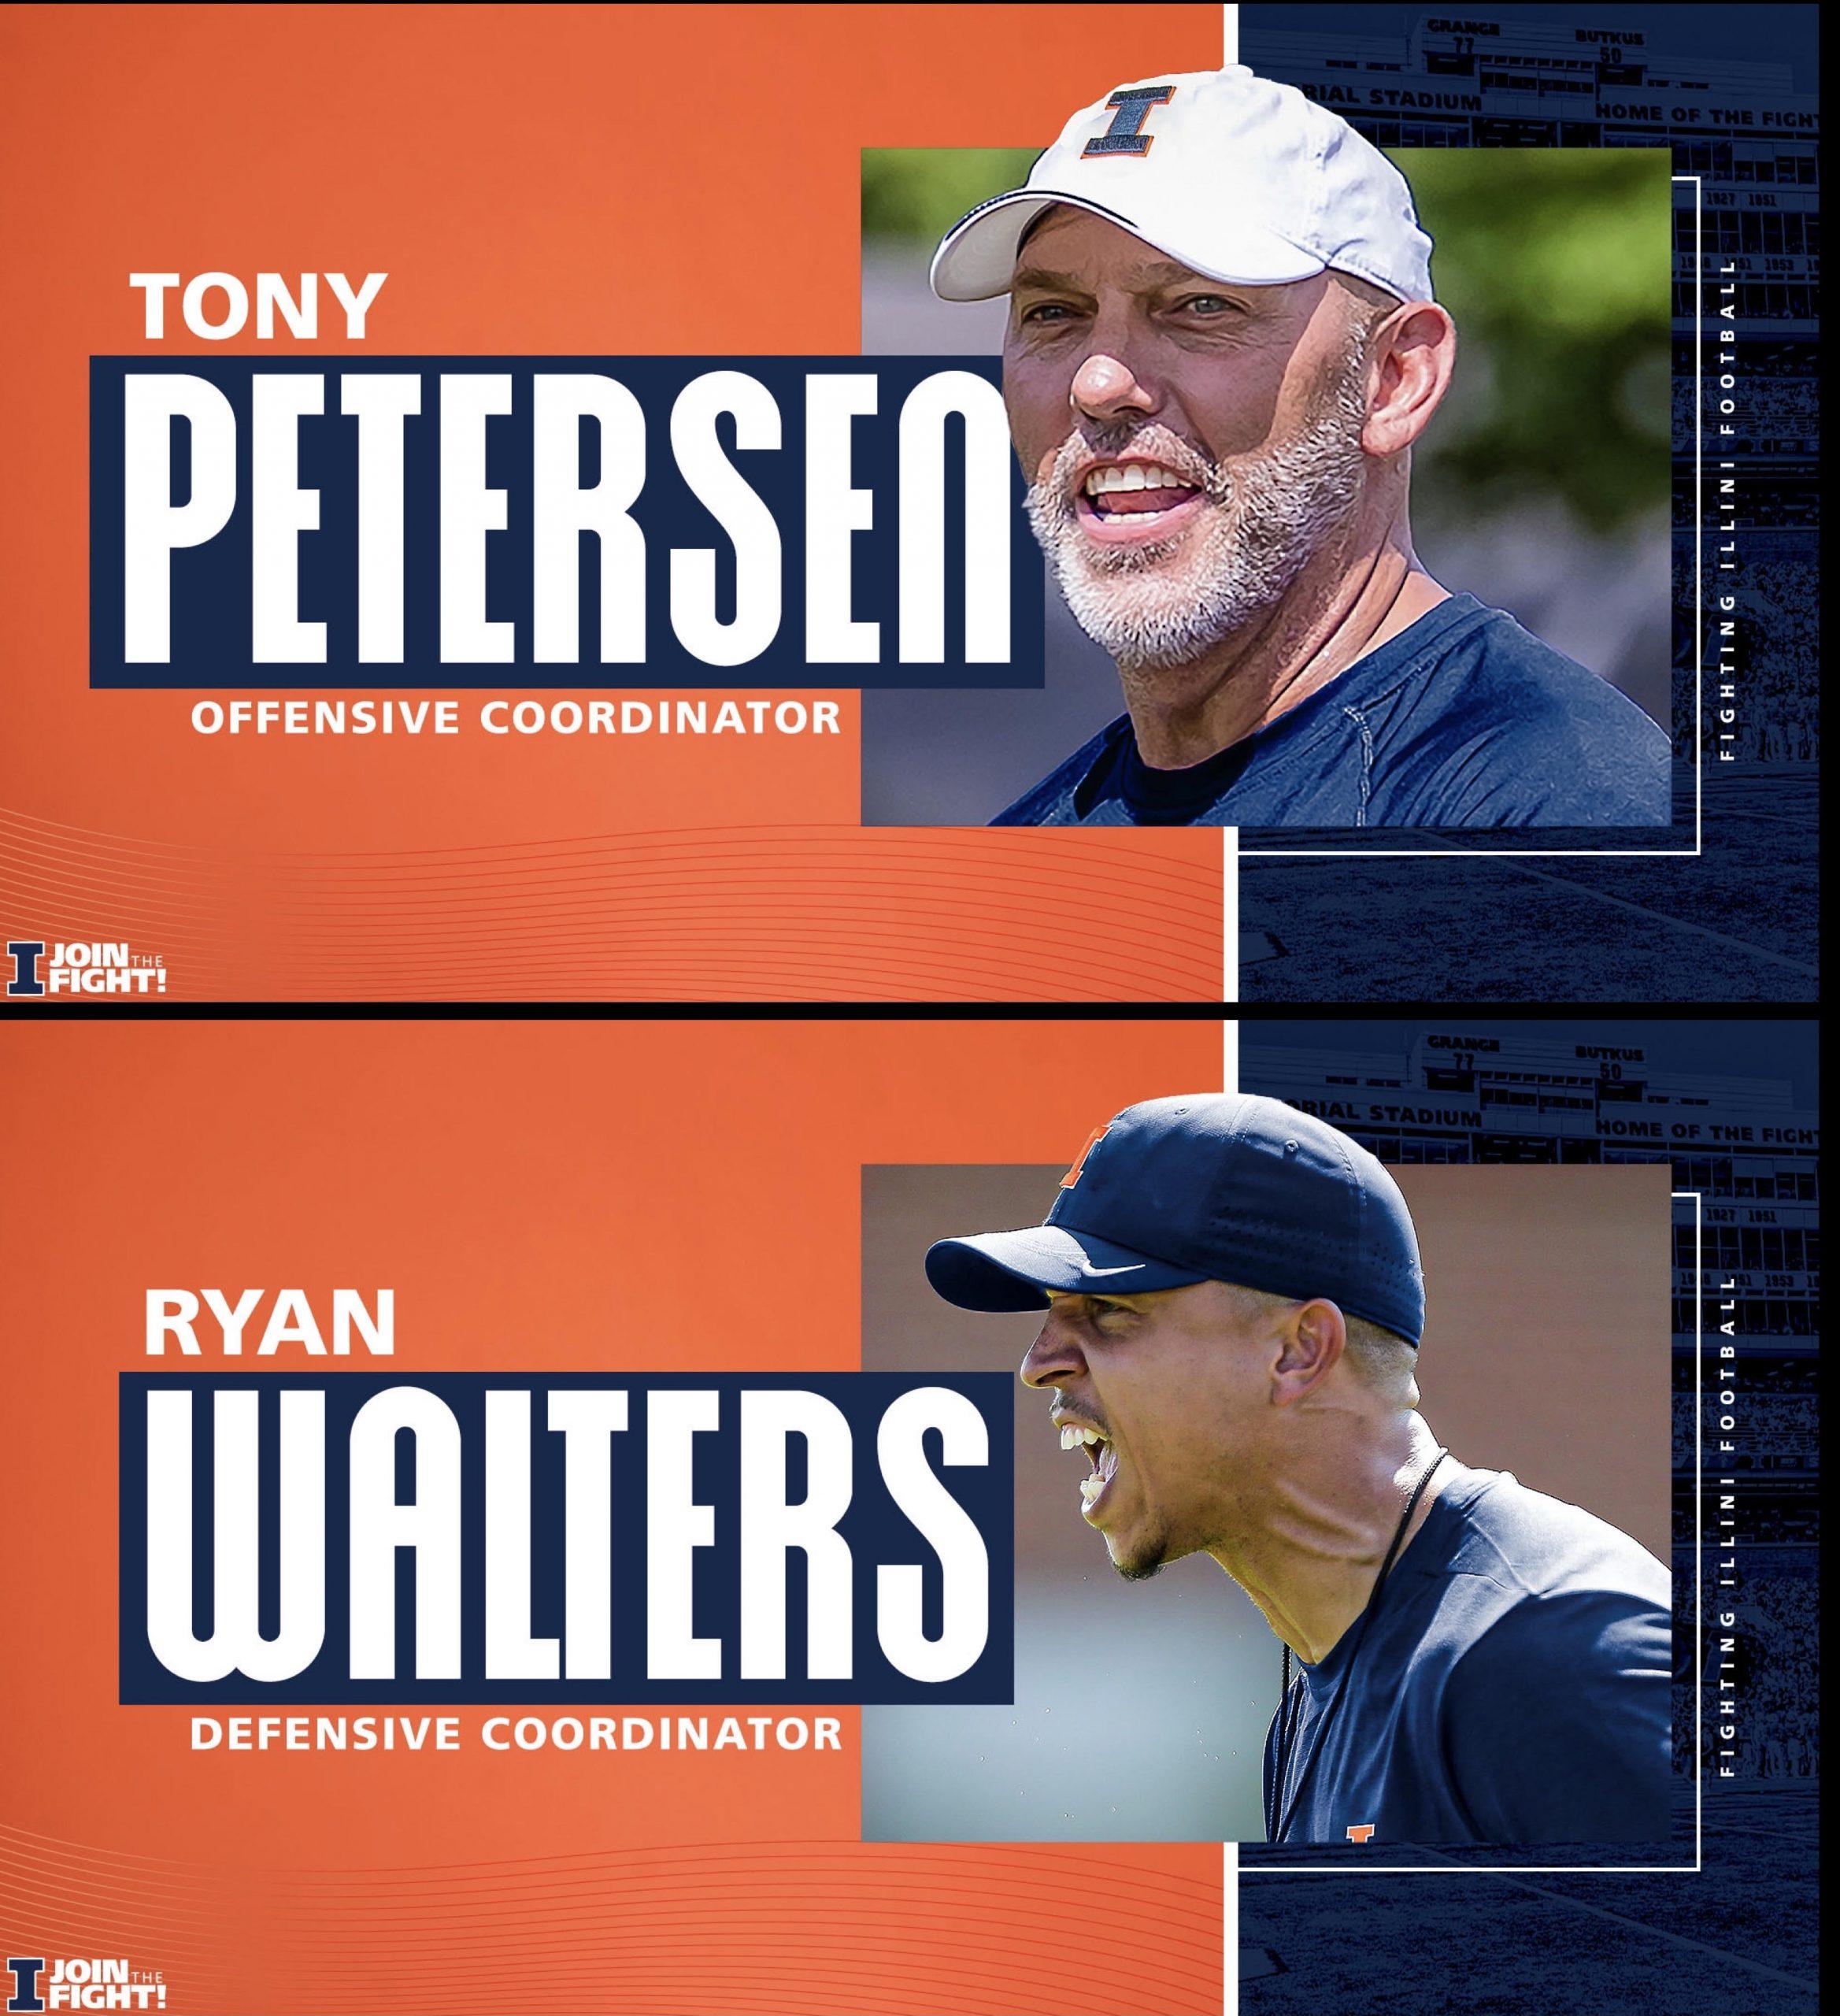 Football Coaching Staff Hires - The Coordinators